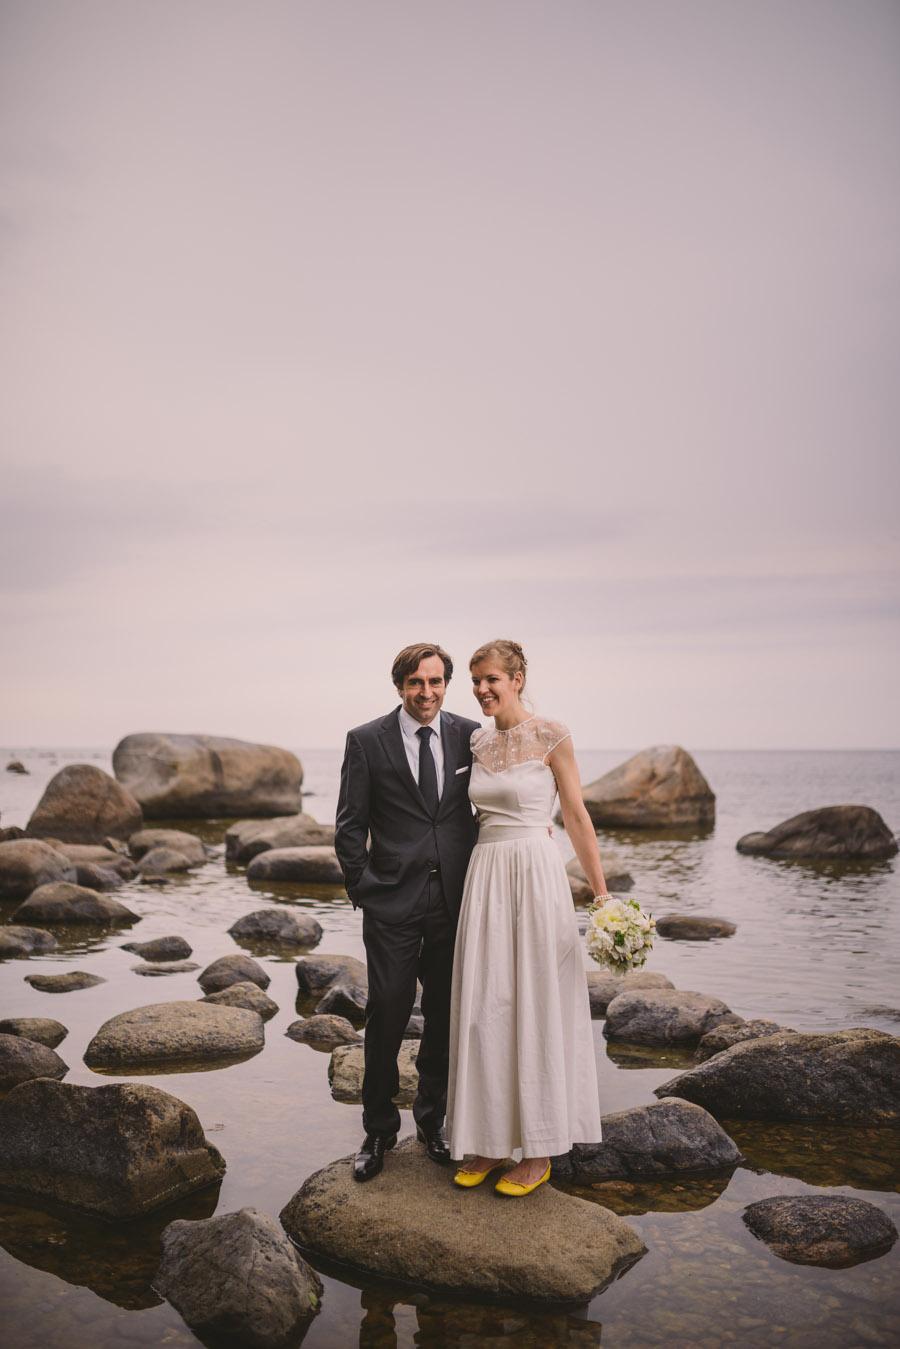 French wedding - Käsmu / Estonia 169